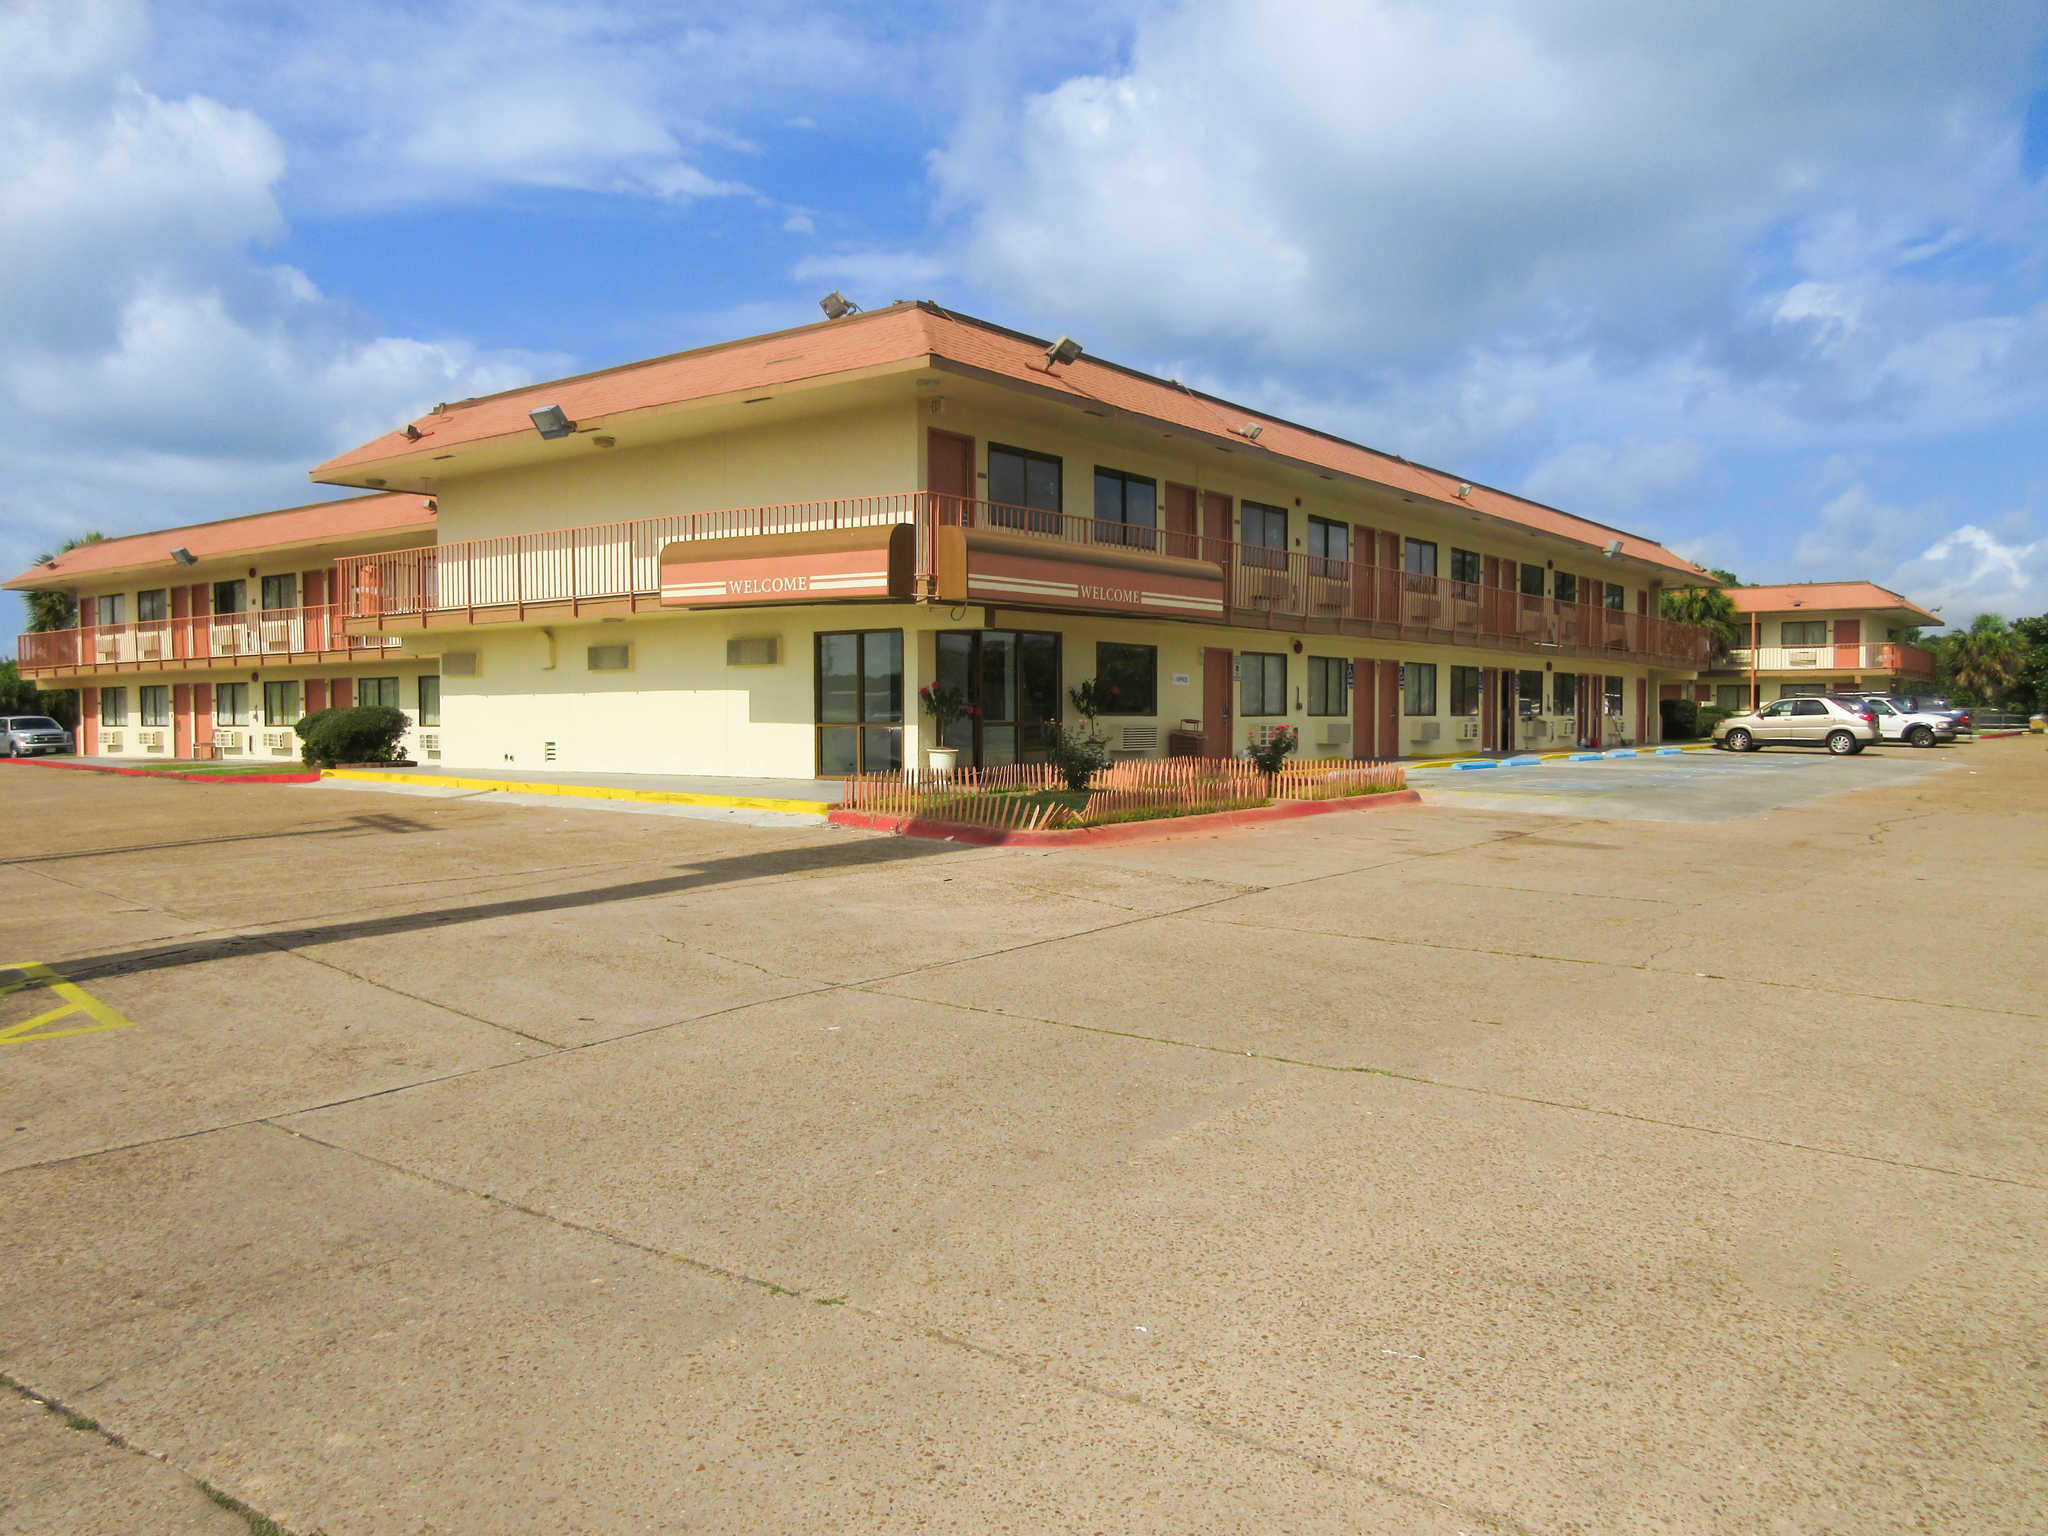 Hotels And Motels In Lake Charles Louisiana